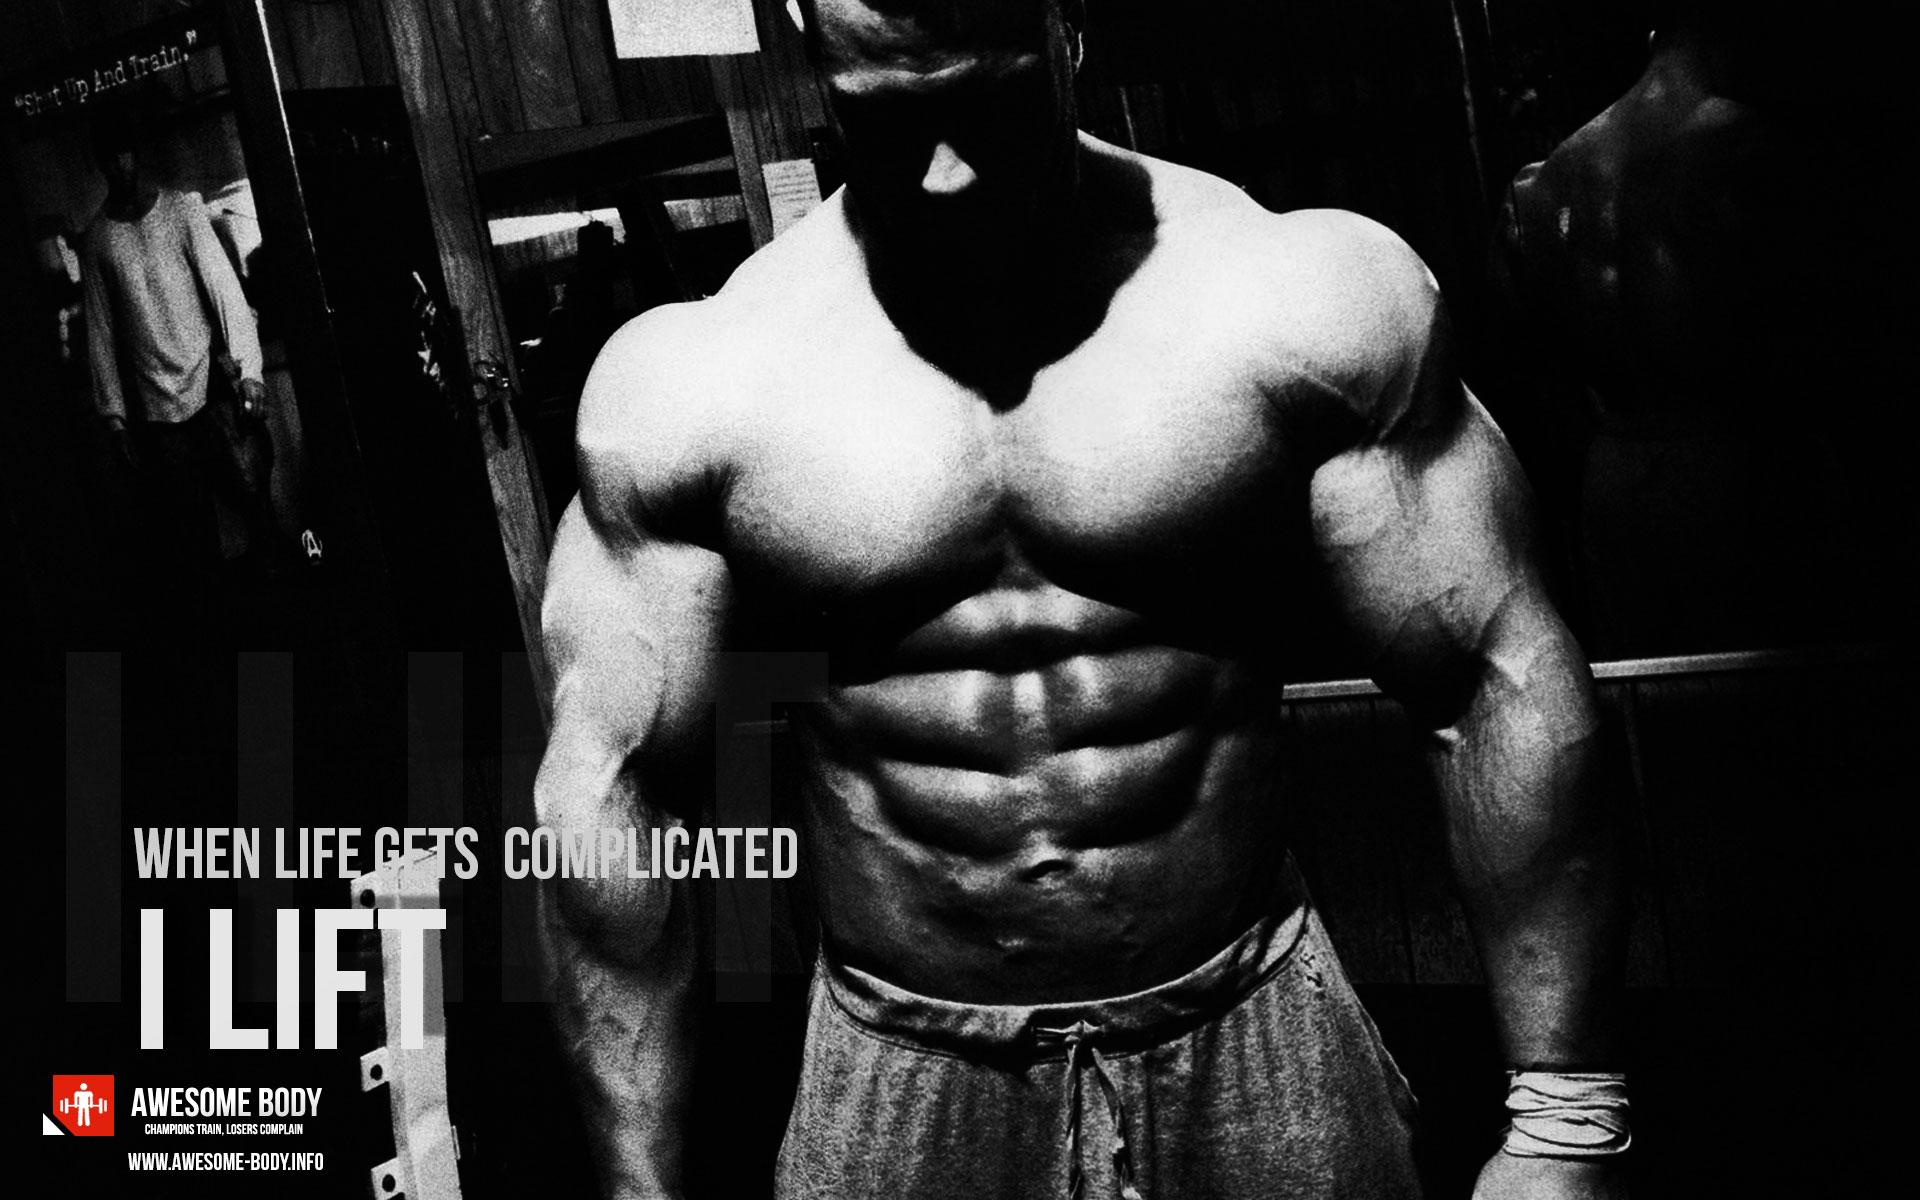 Bodybuilding Most Motivational Wallpapers I Lift Bodybuilding site 1920x1200